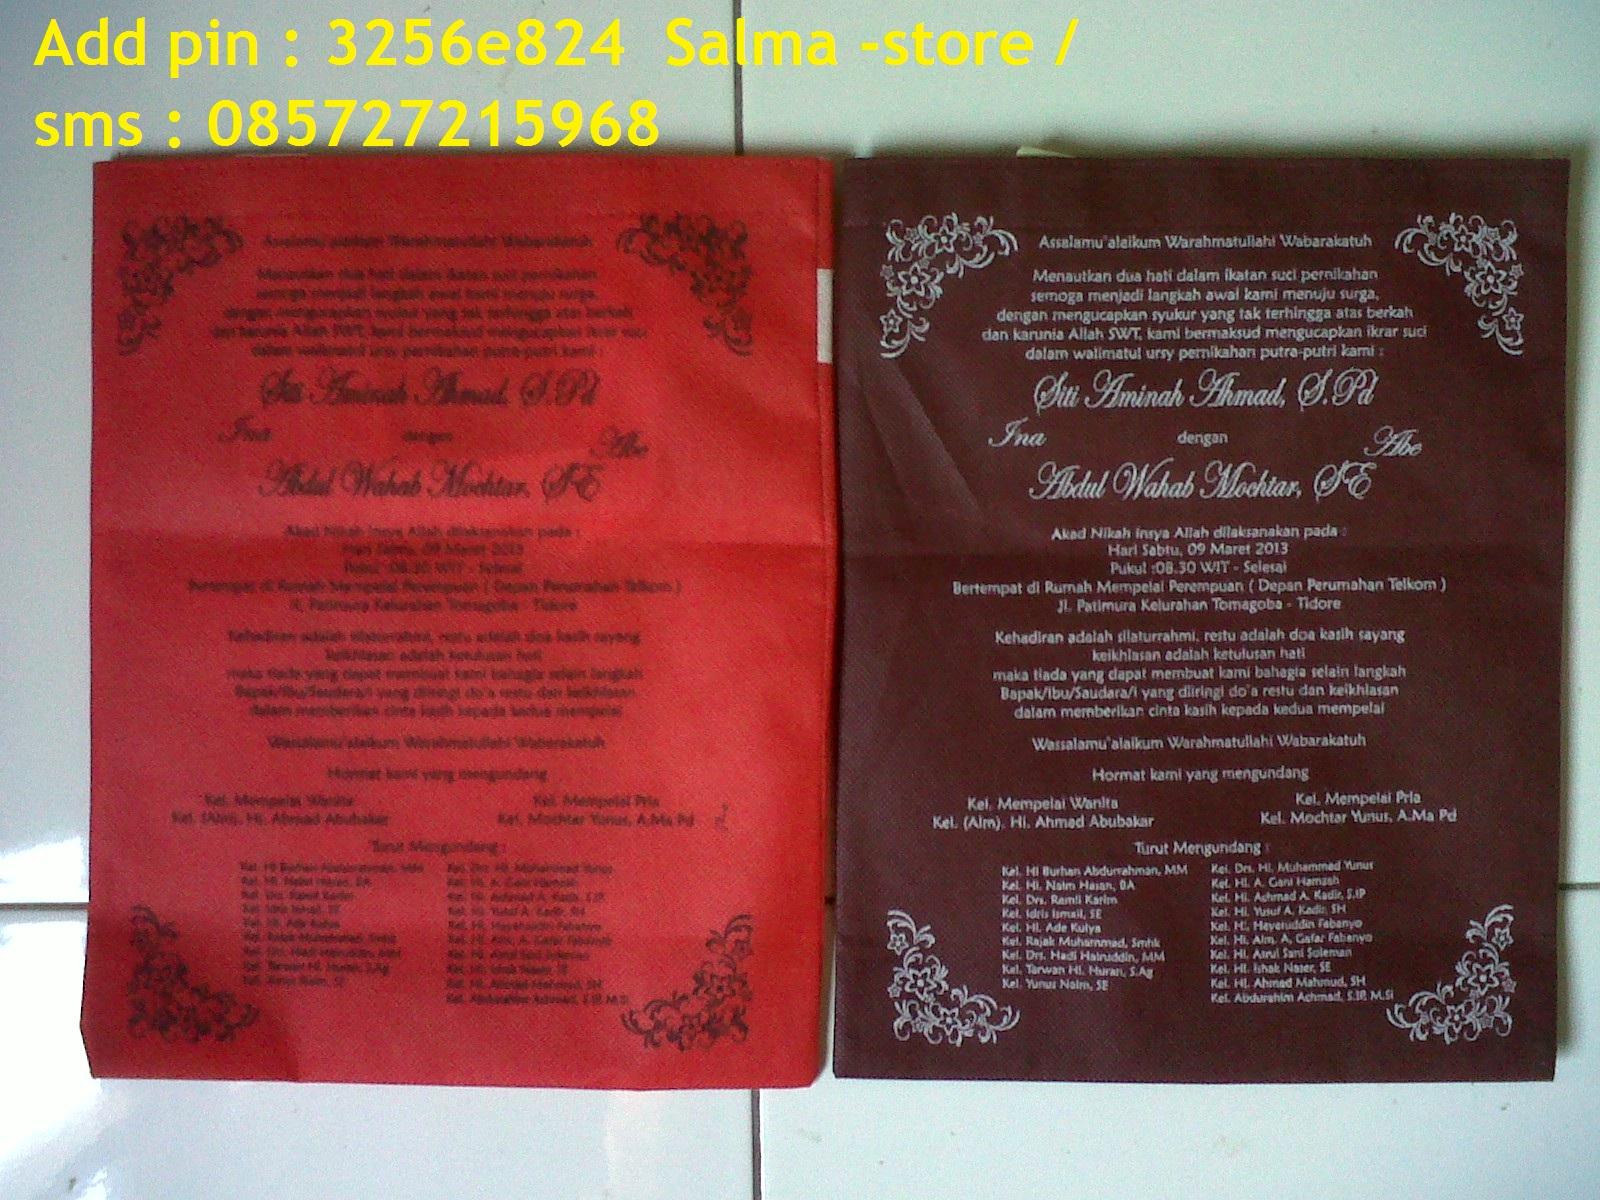 Pesanan Undangan Pernikahan batik Februari - Maret